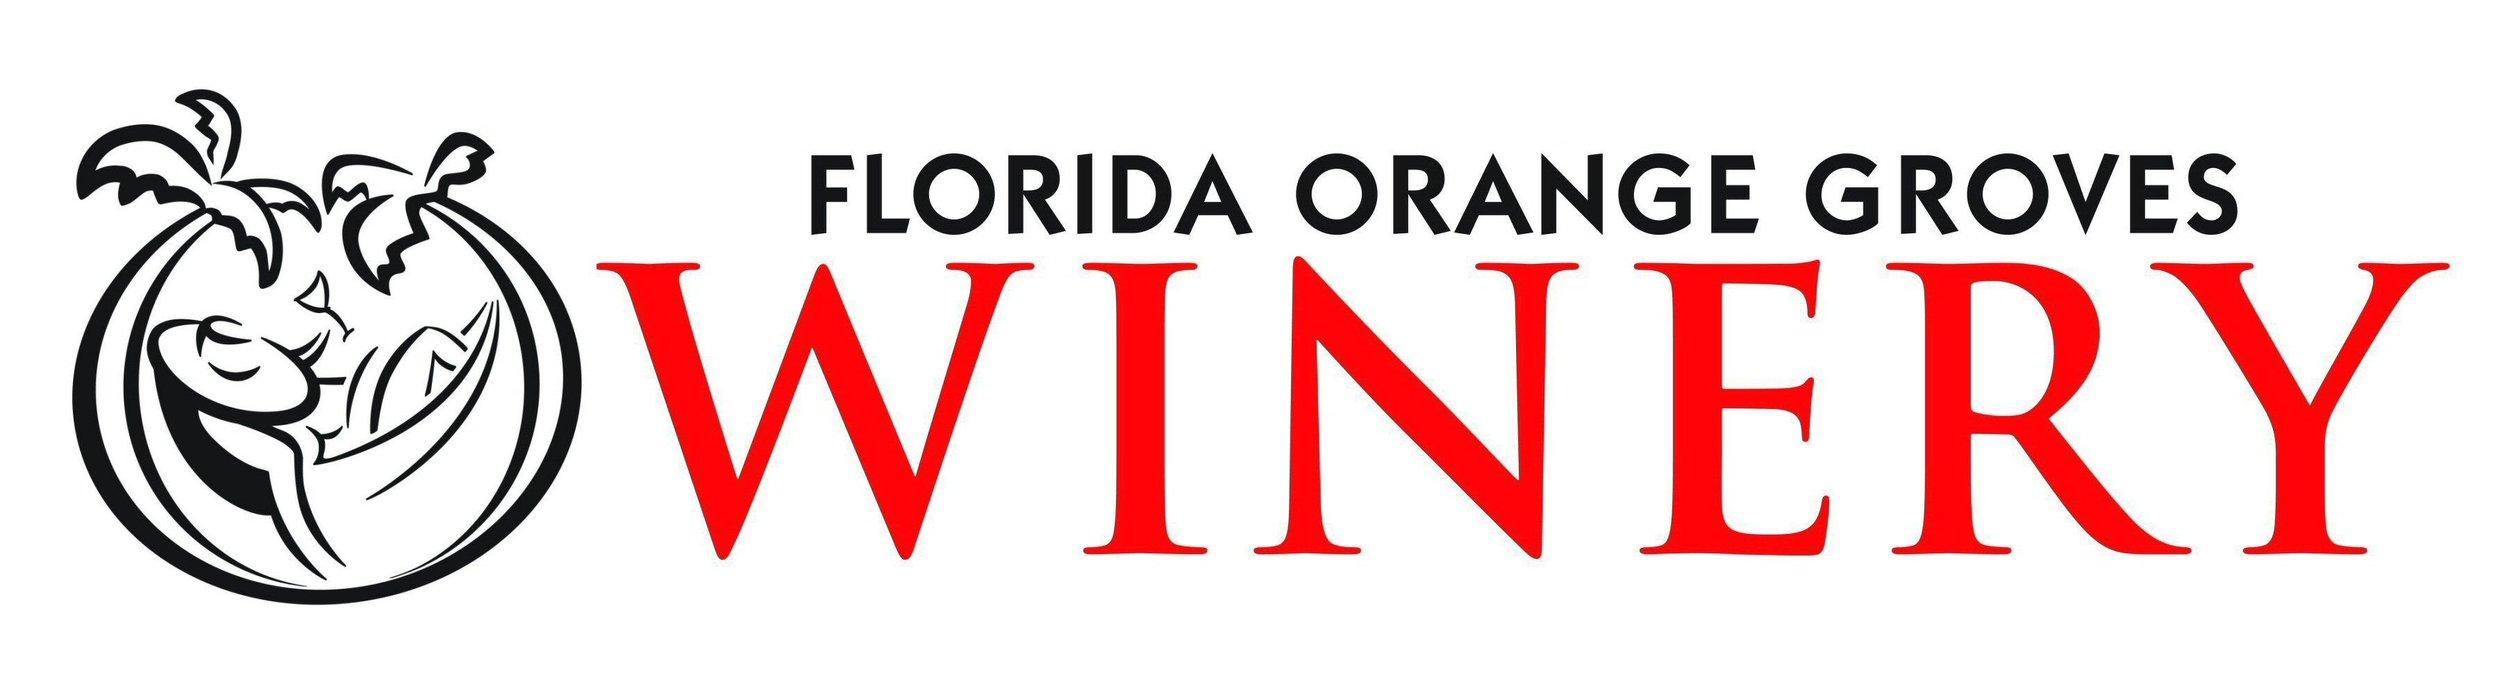 Florida Orange Groves Winery Logo.jpg